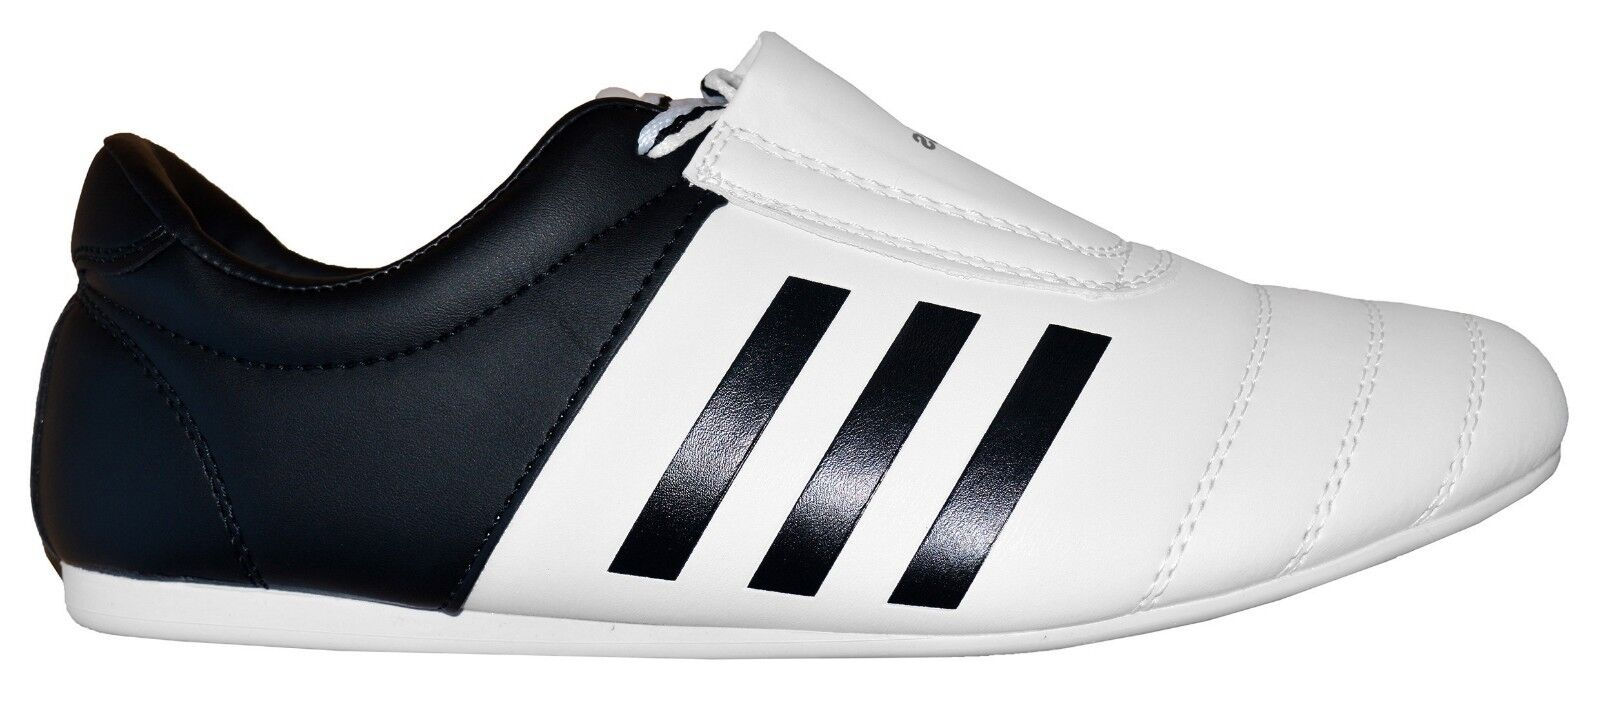 adidas martial - arts - trainer adi - trete ich karate taekwondo - adi training schuhe, weiße 0c11b4